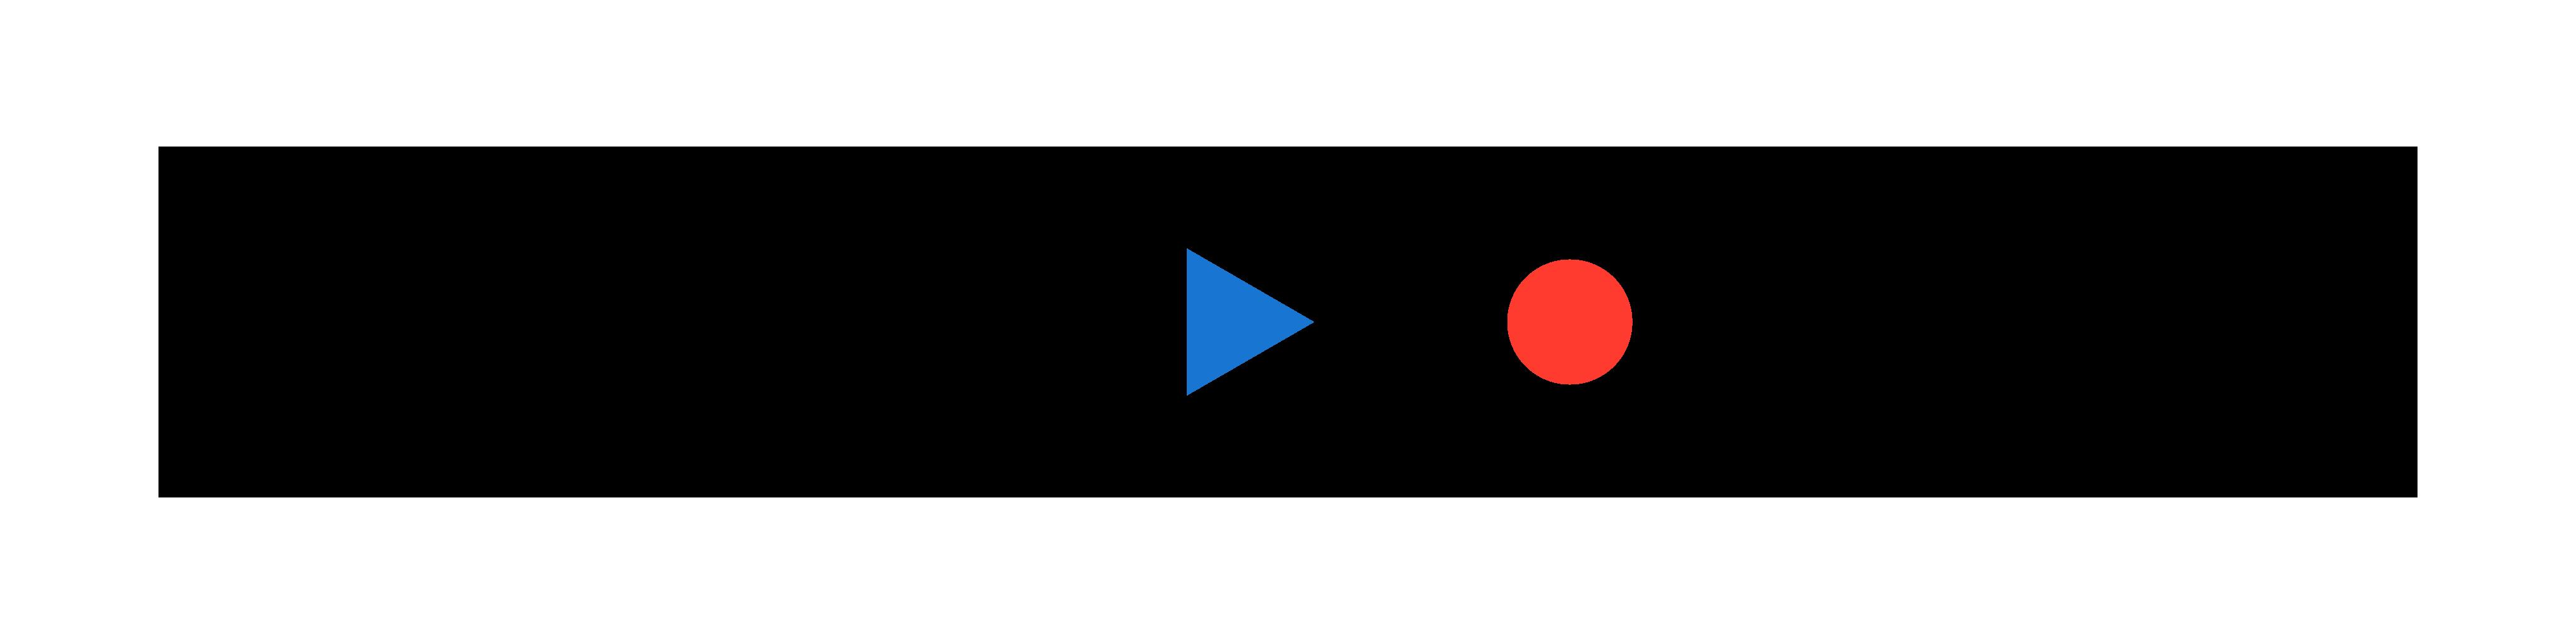 VidCorp black logo